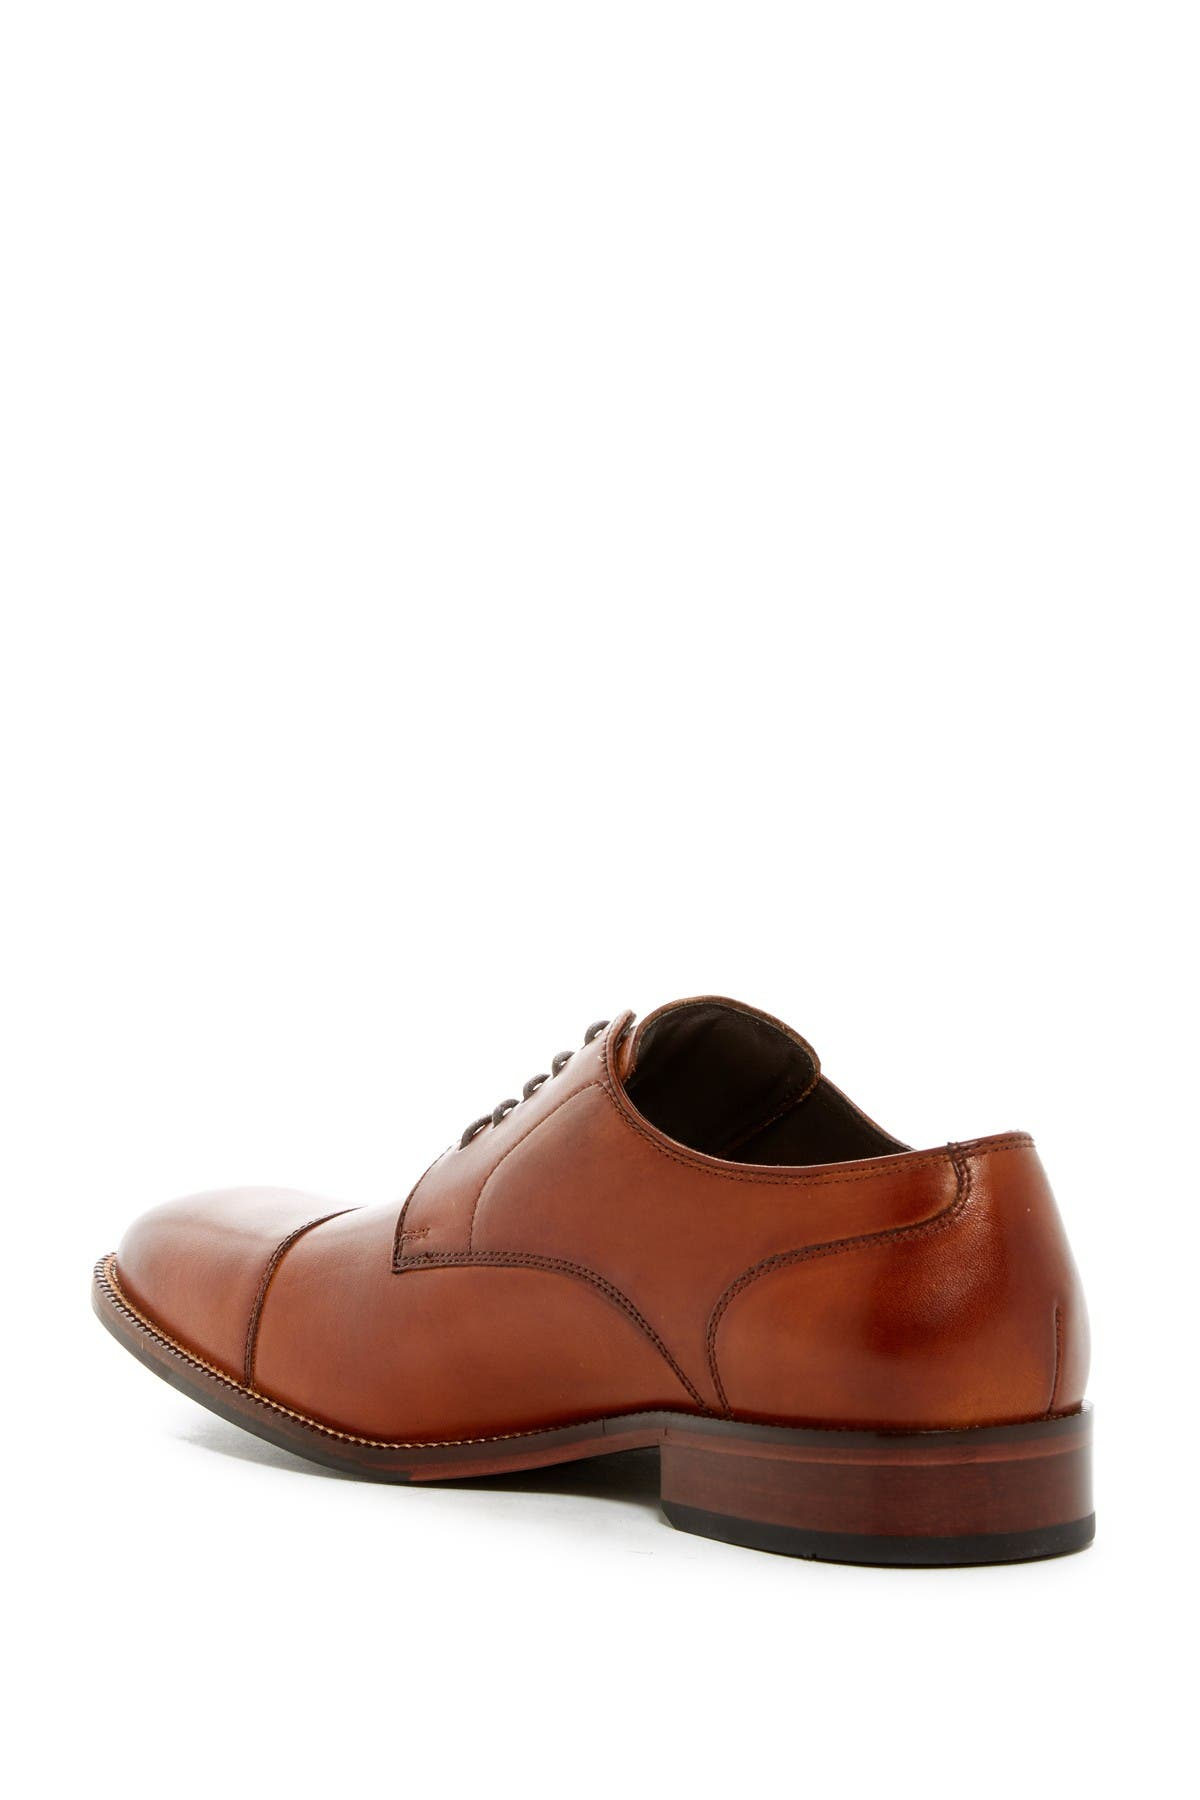 Benton Leather Cap Toe Derby II